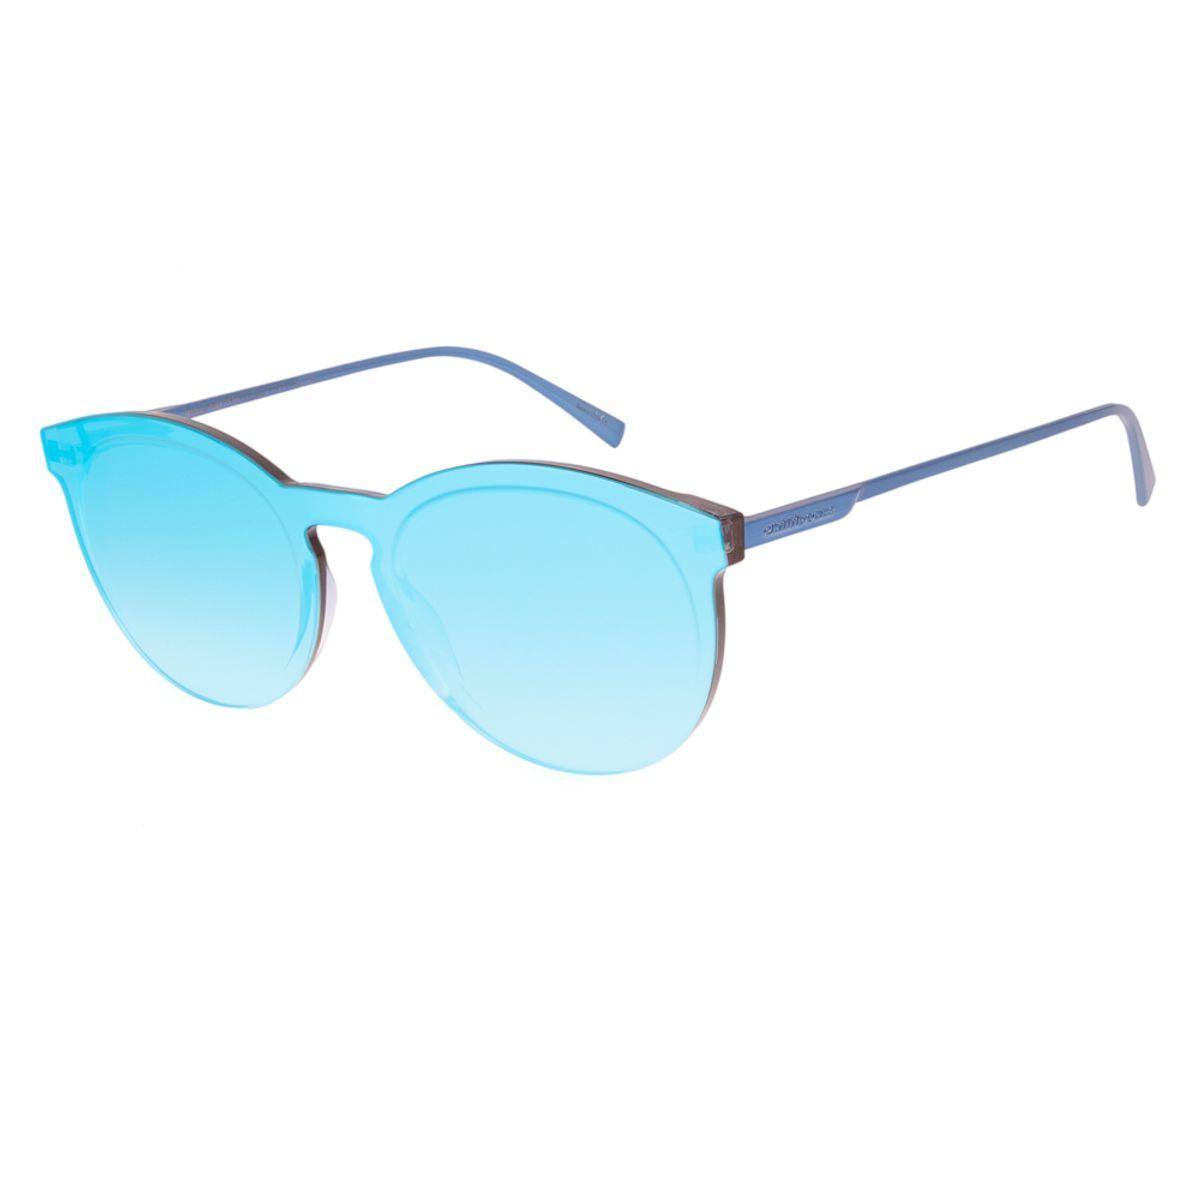 57e4e0ec7 Óculos De Sol Chilli Beans Feminino Block Redondo Azul Espelhado ...